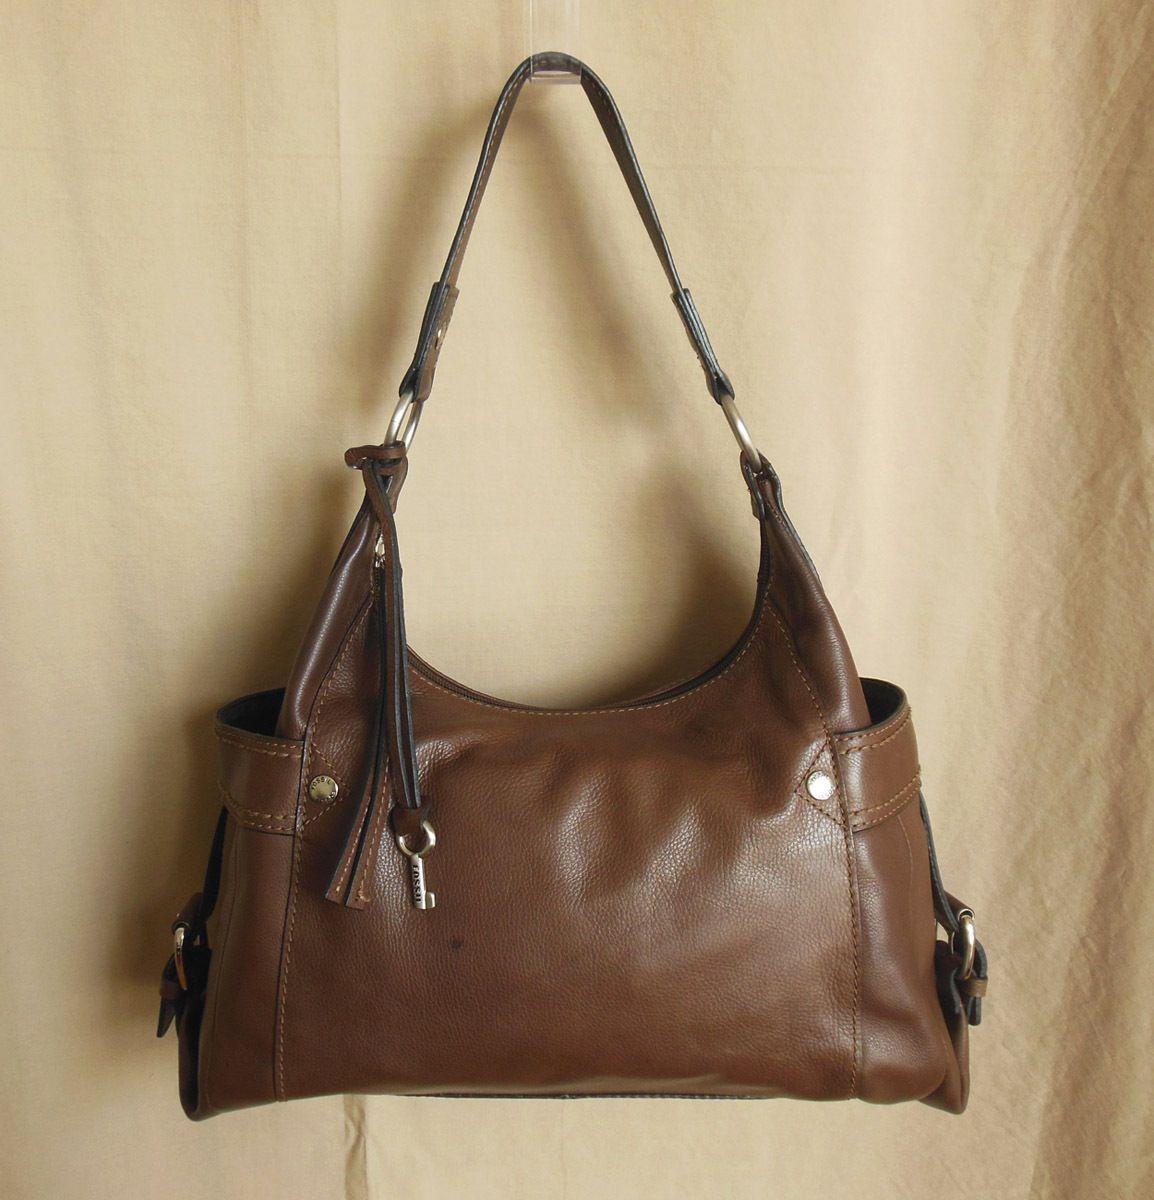 4c5010852a Fossil Key Purse Large Brown Soft PEBBLED Leather Zip Hobo Shoulder Bag  75082